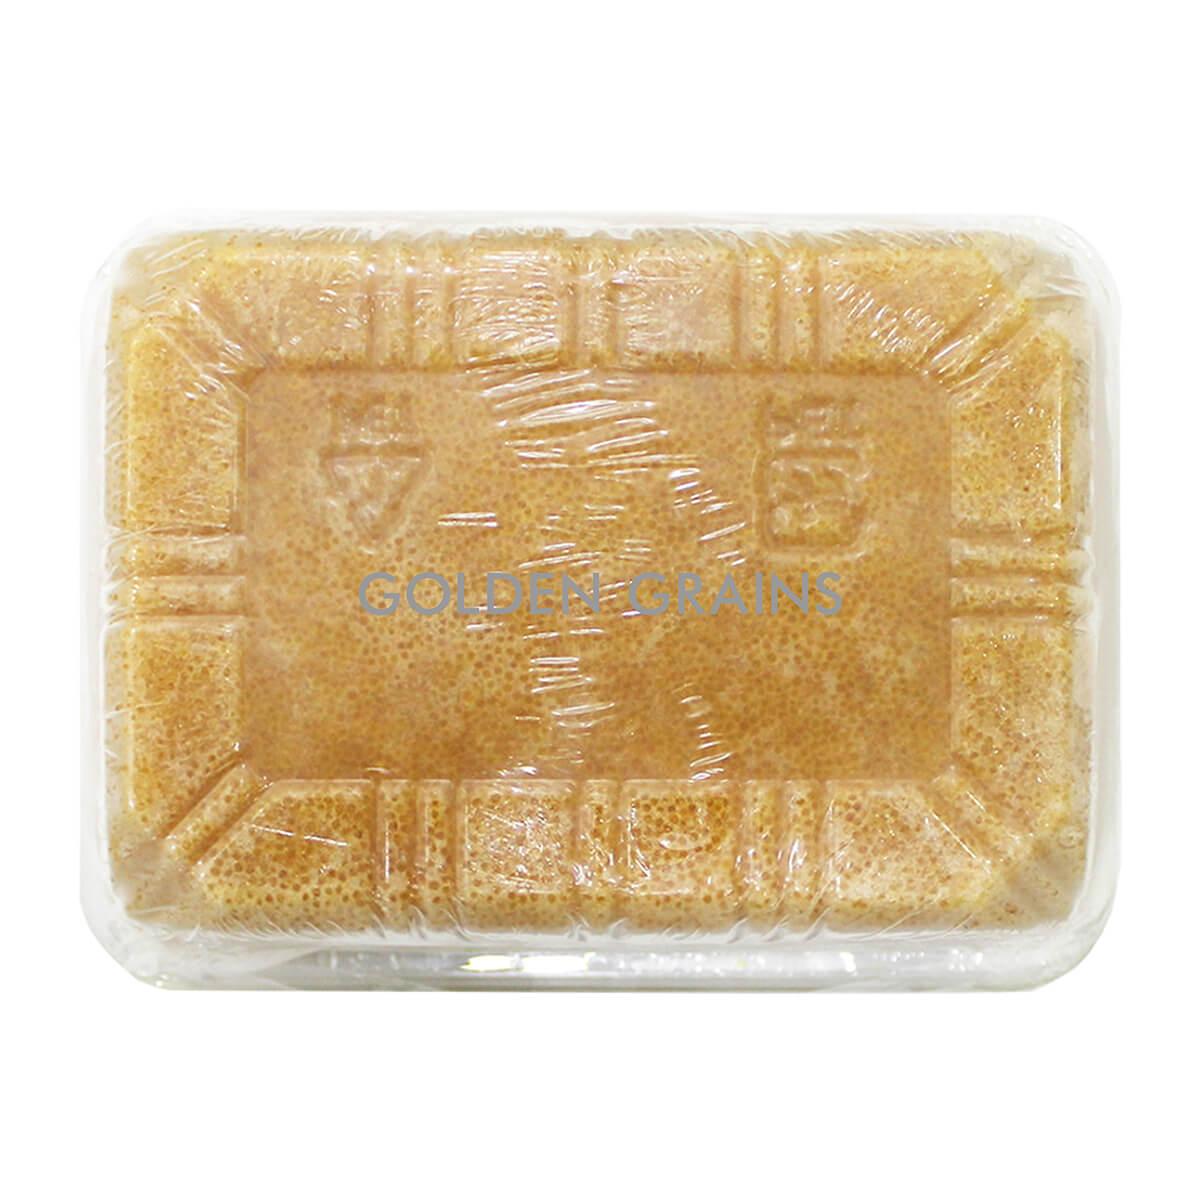 Golden Grains GGFT - Tobiko Gold China - Back.jpg